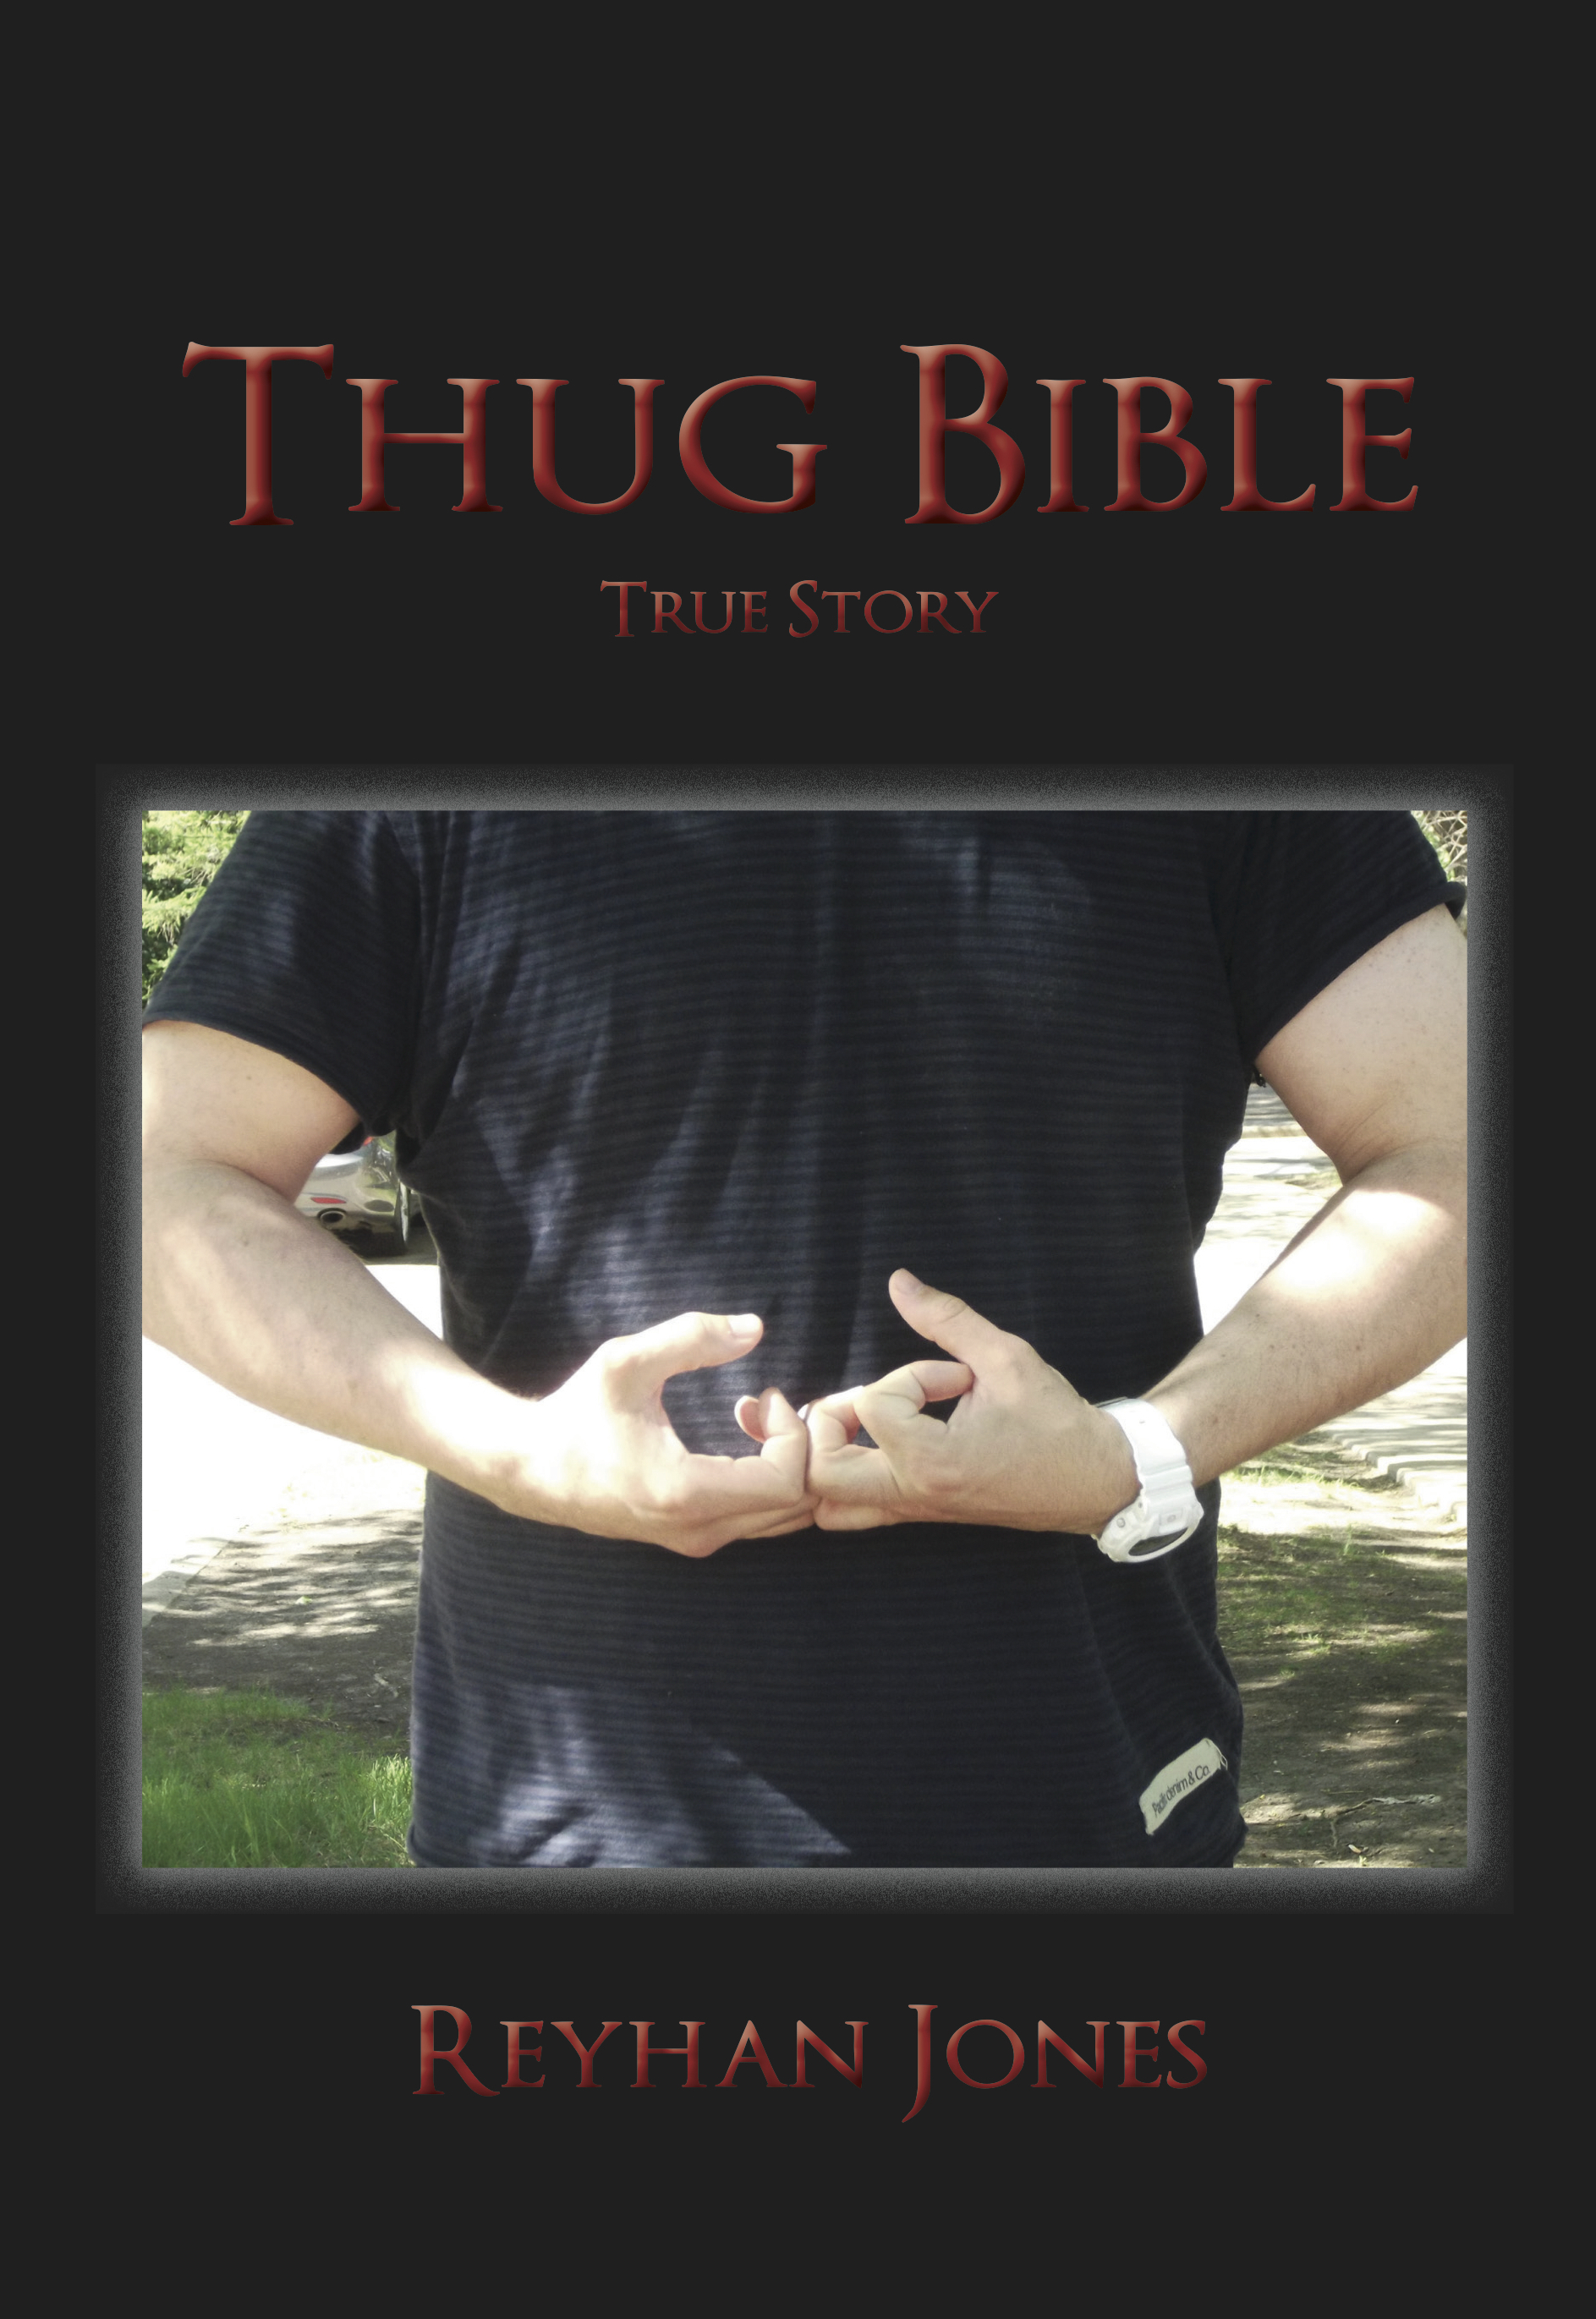 Thug Bible: True Story Reyhan Jones